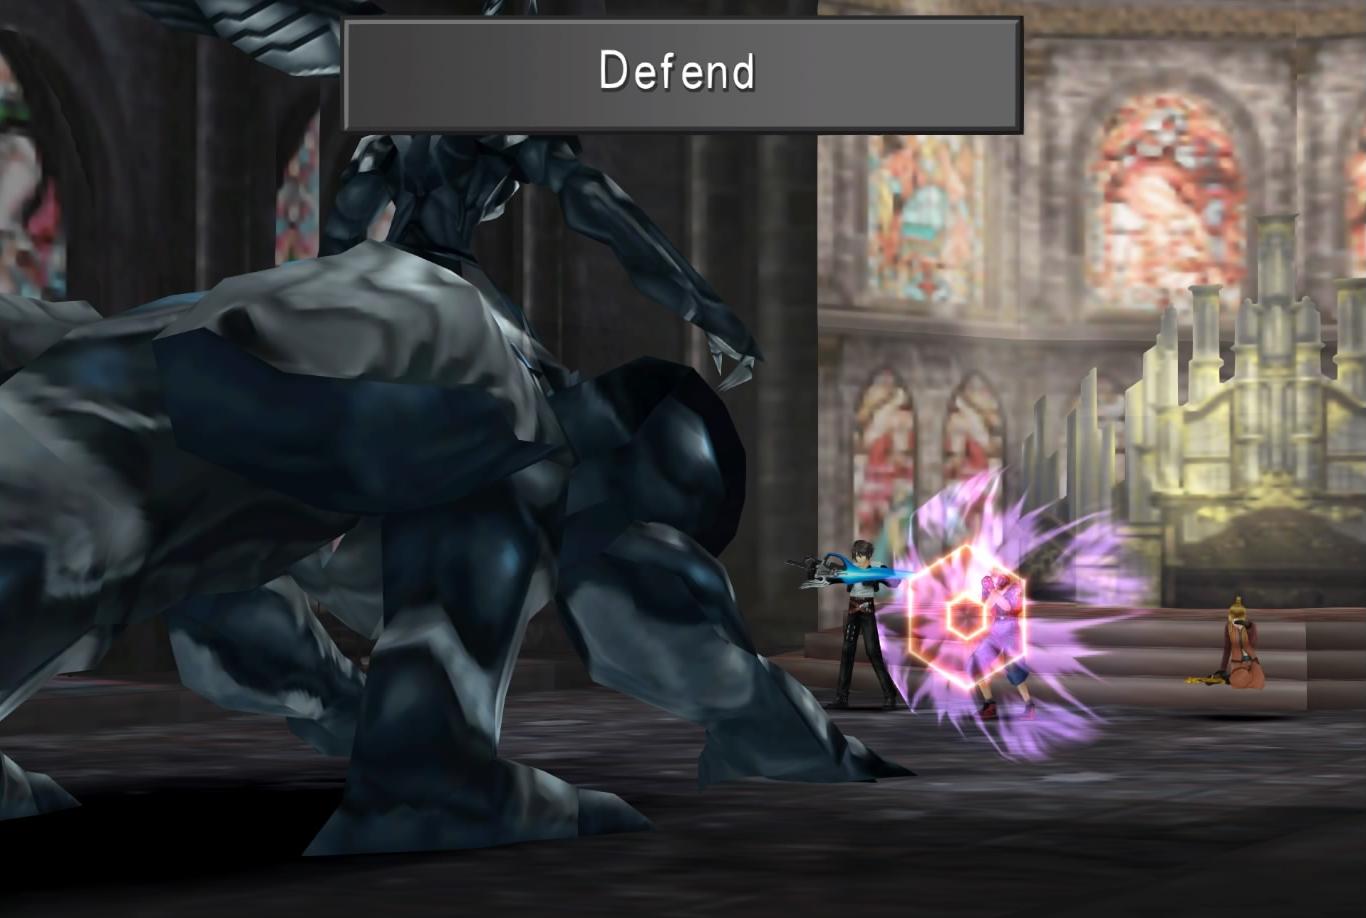 File:FFVIII Defend.png